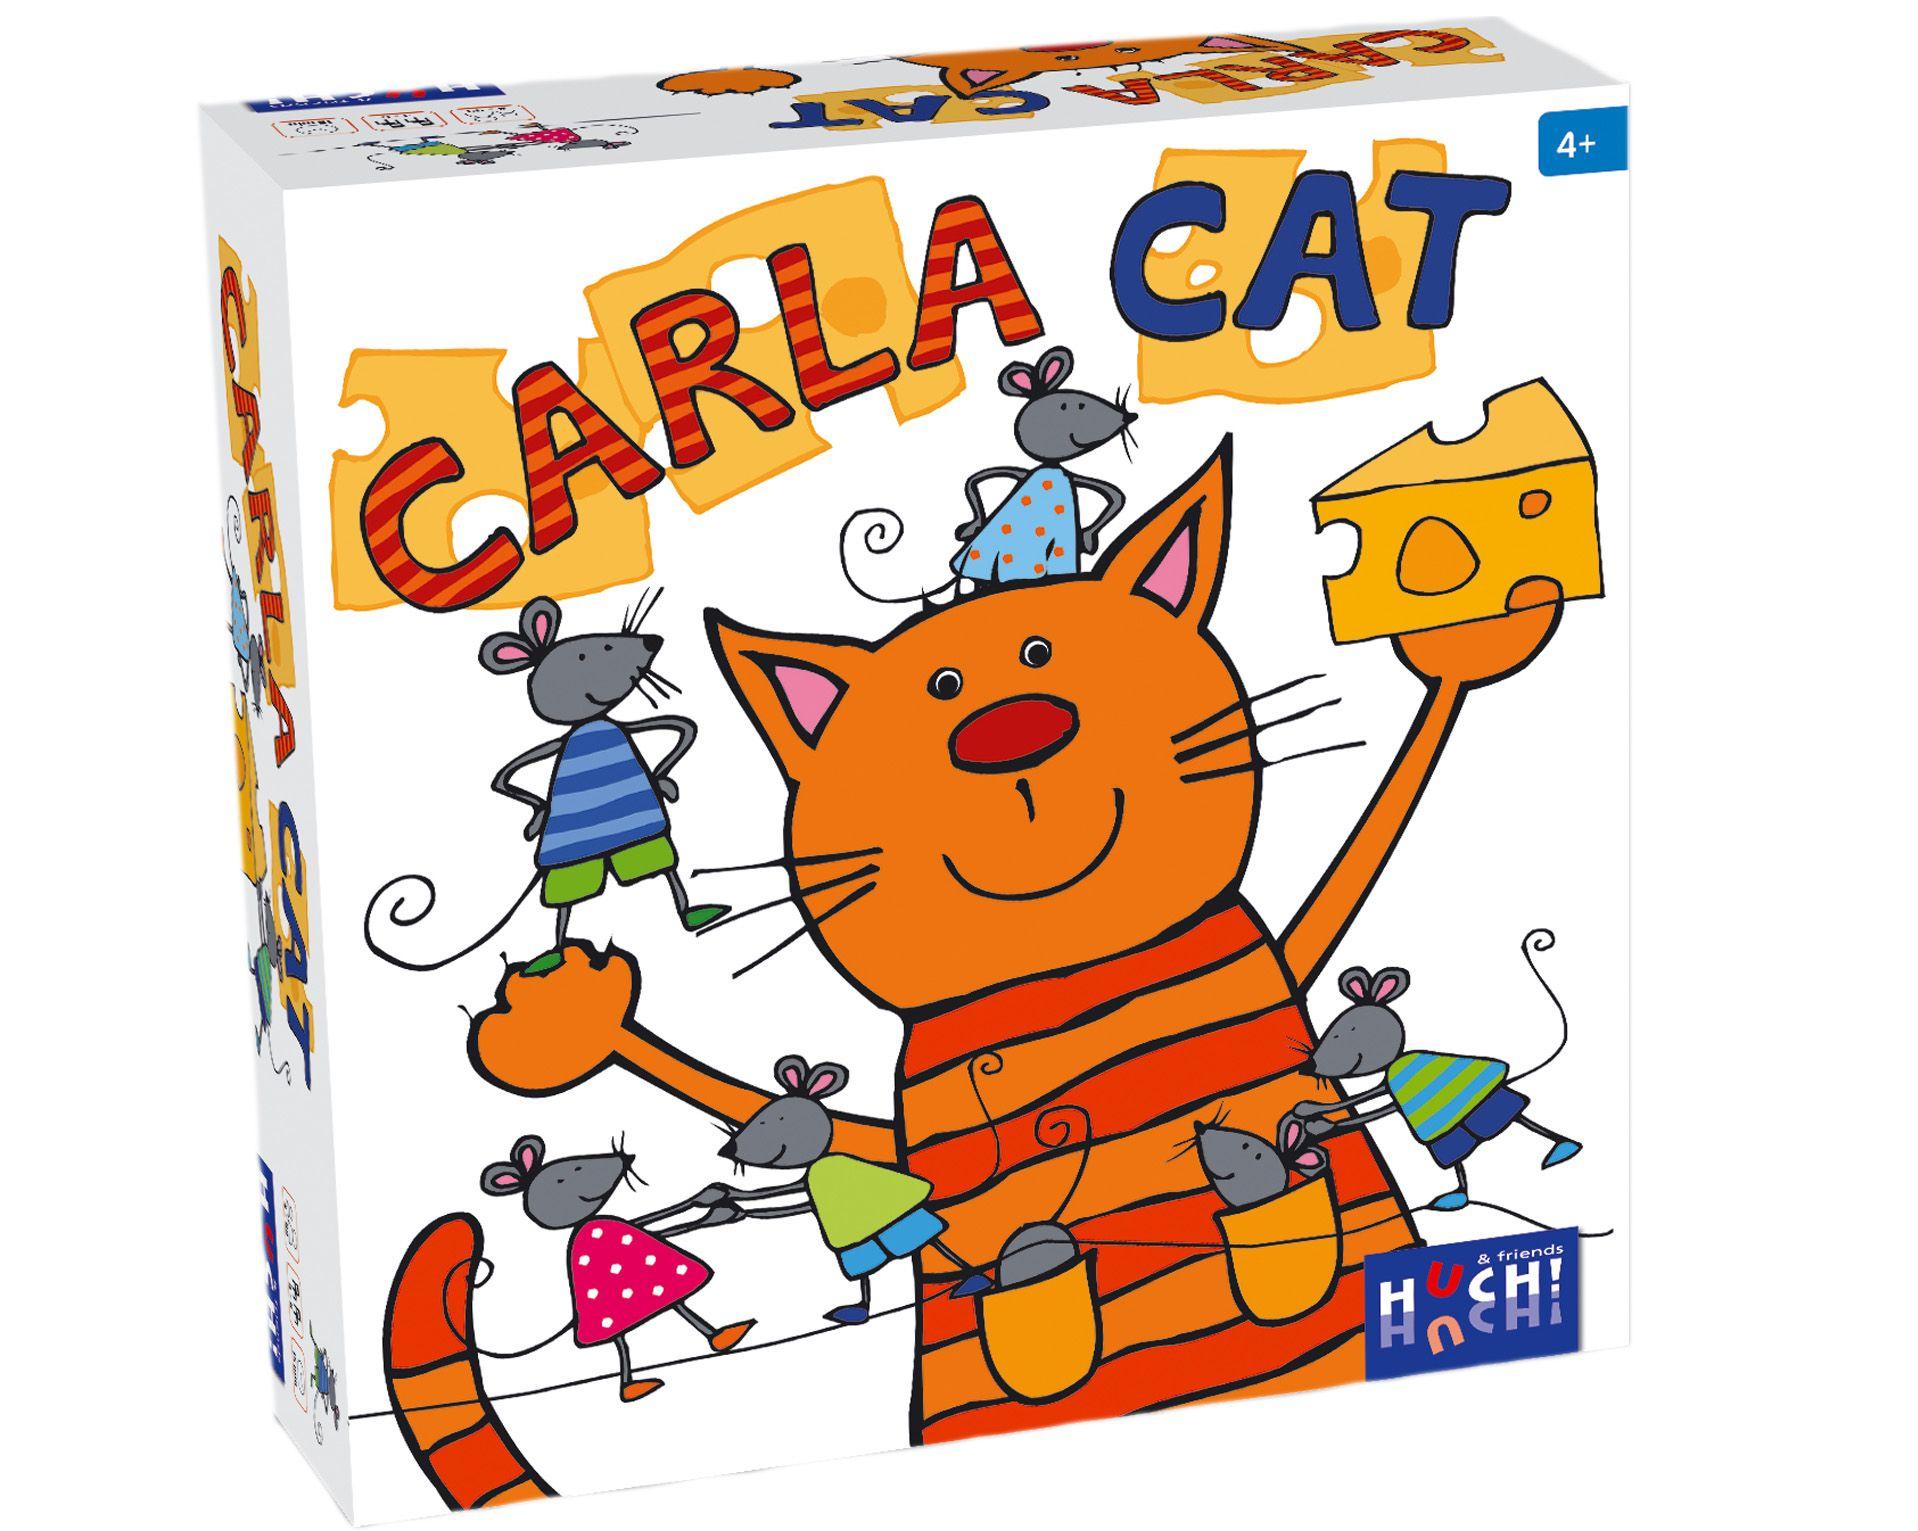 HUCH FRIENDS Huch! & friends Kinderspiel, »Carla Cat«